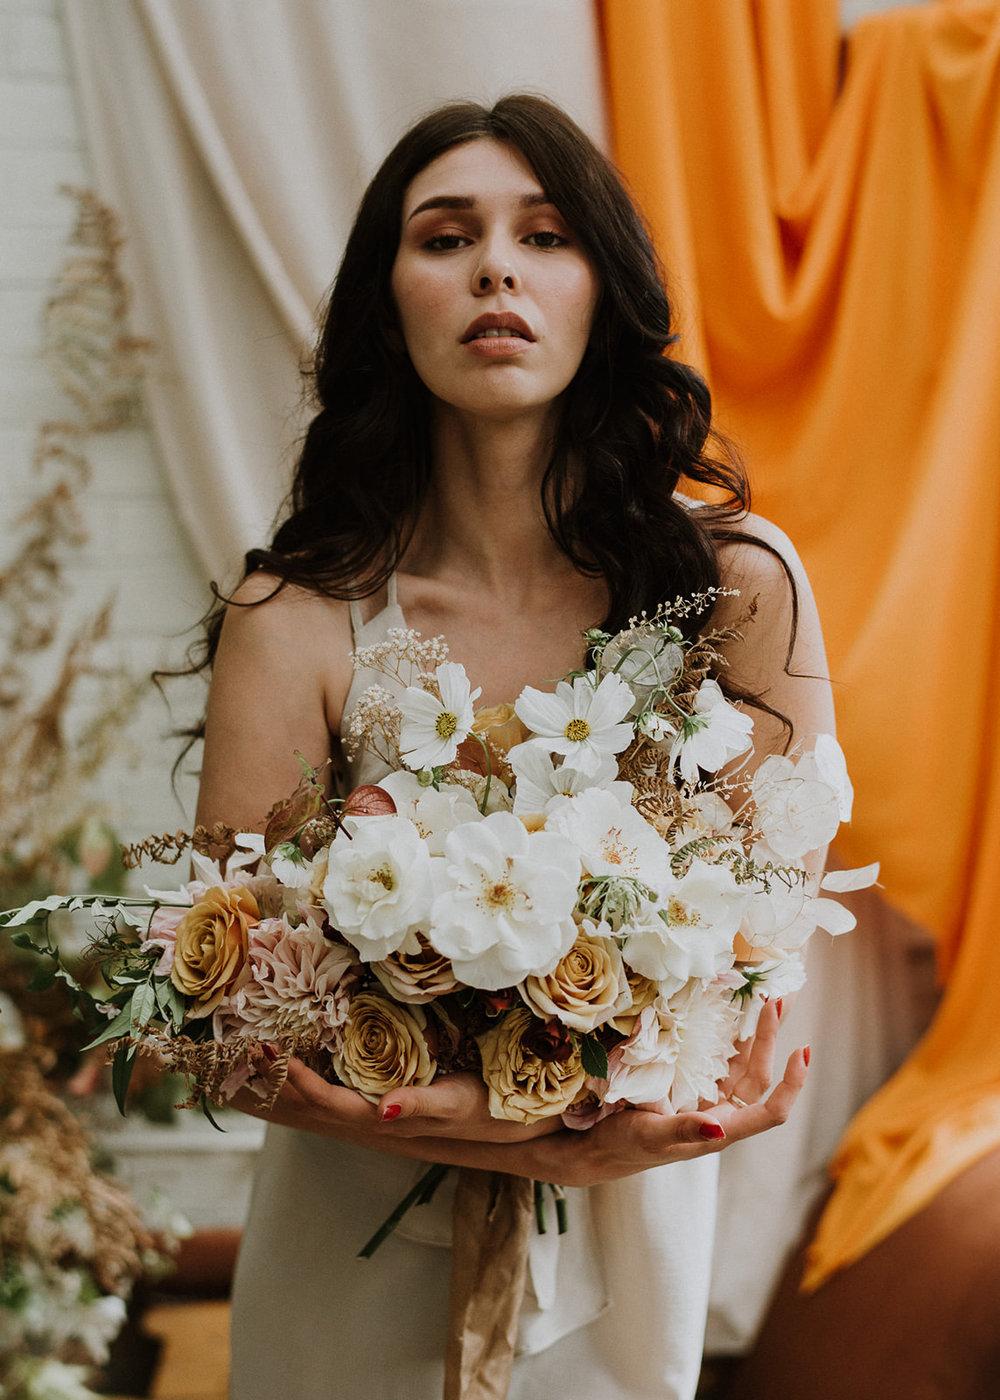 Flower and Fern Sussex Florist Wedding Floral Design.jpg